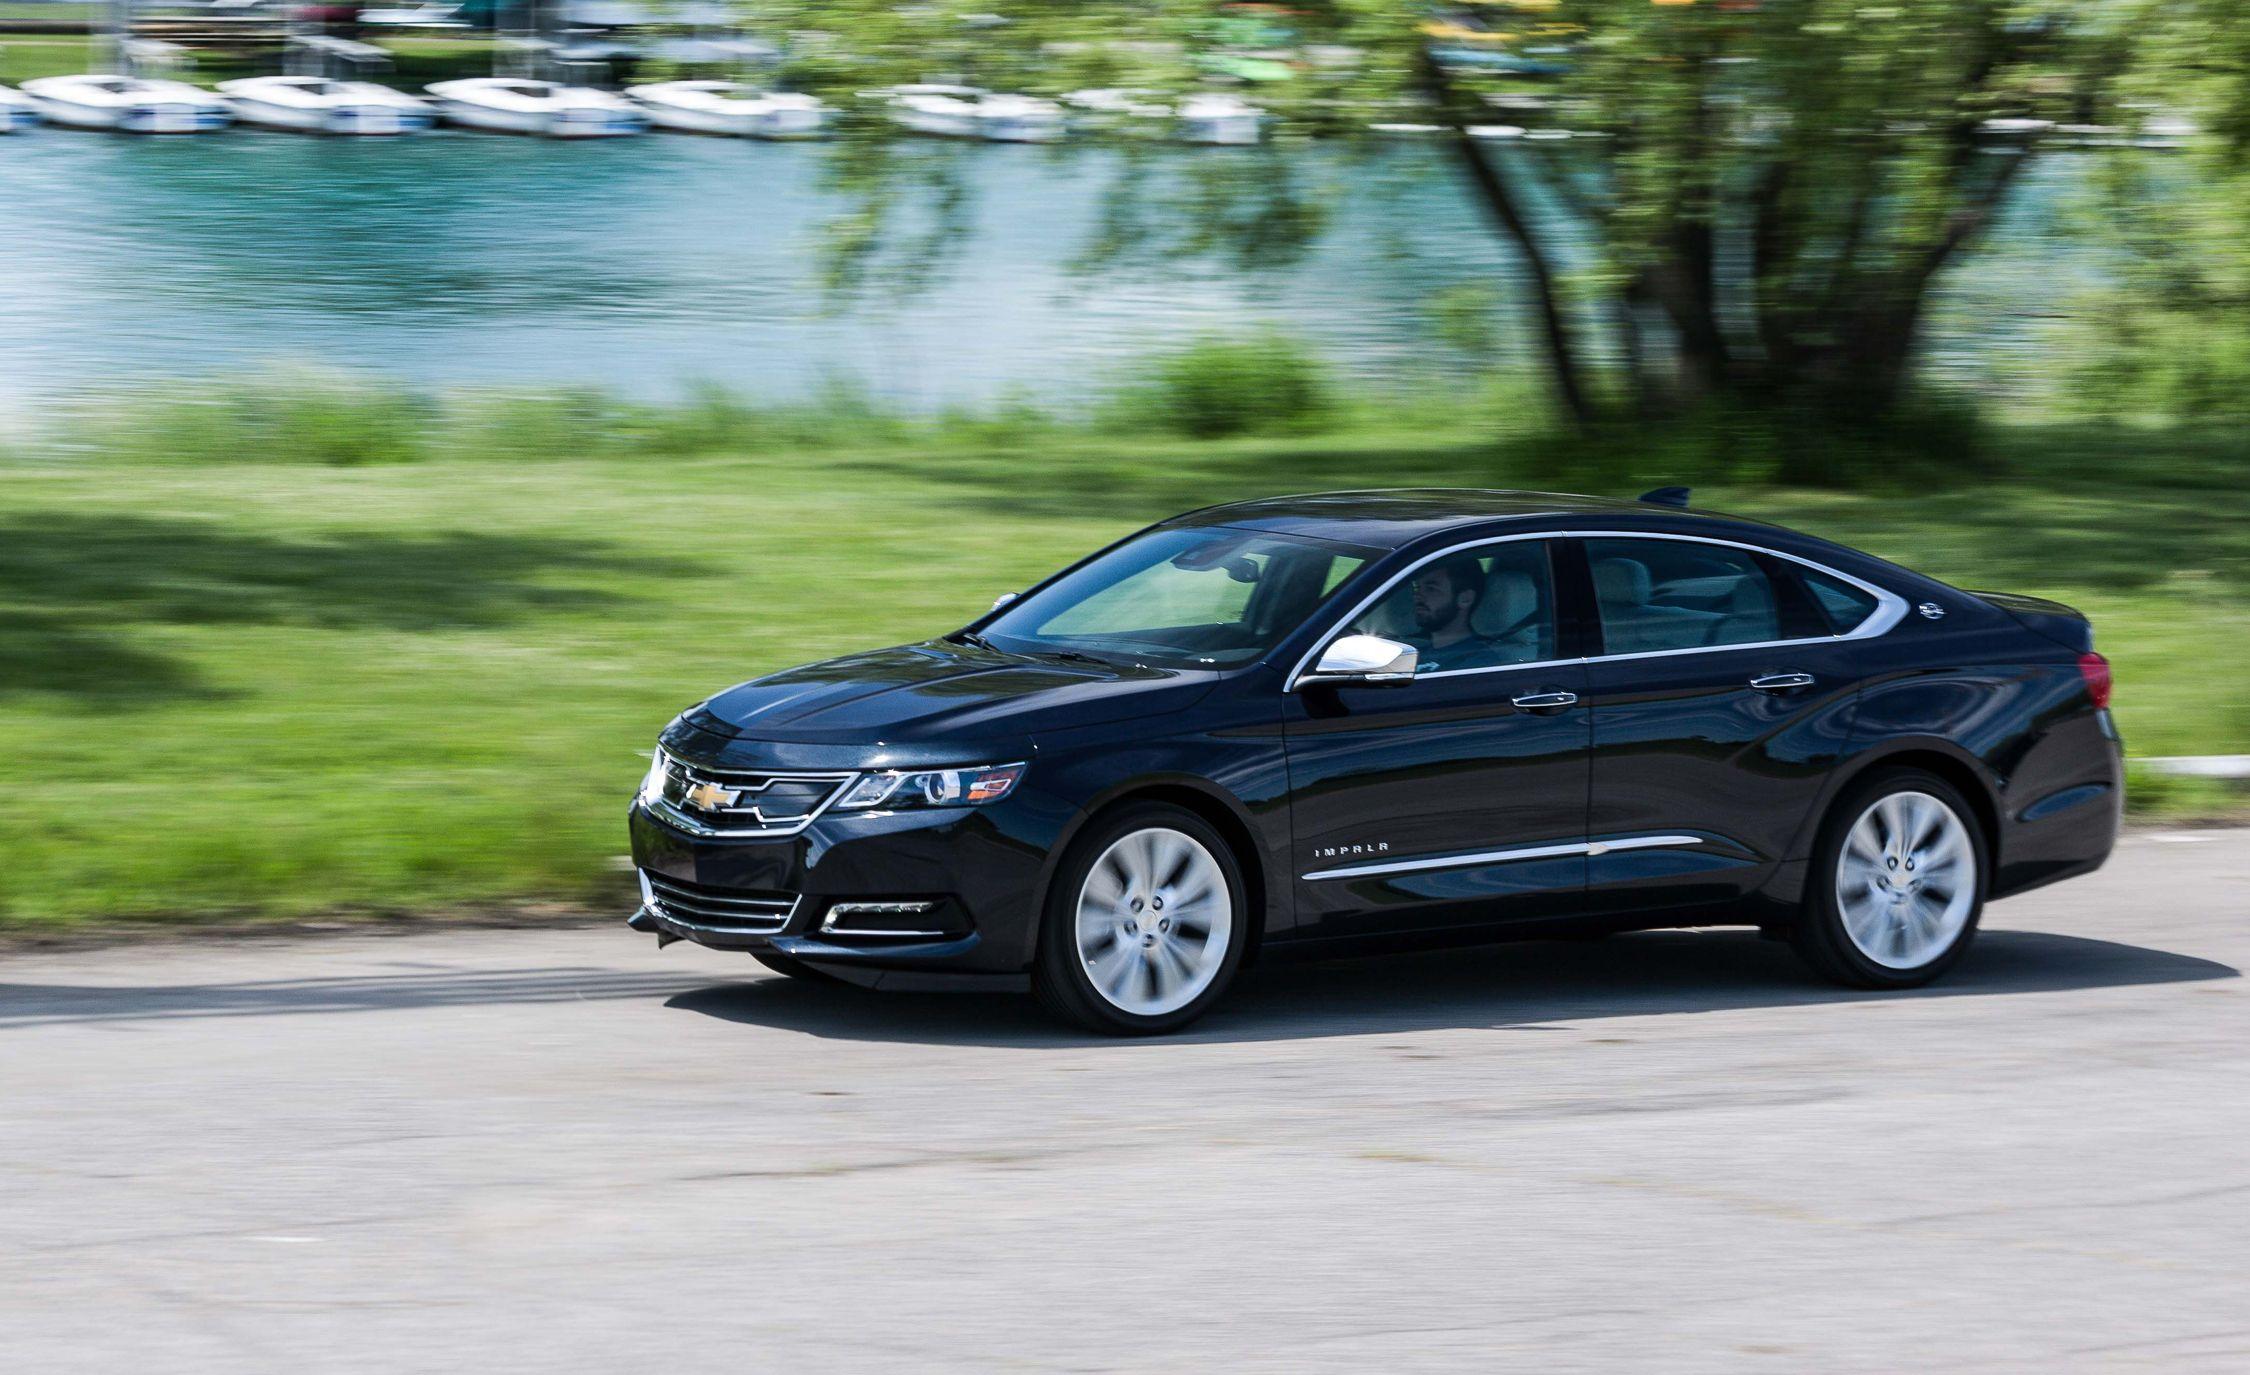 2019 Chevrolet Impala Reviews | Chevrolet Impala Price, Photos, and Specs |  Car and Driver